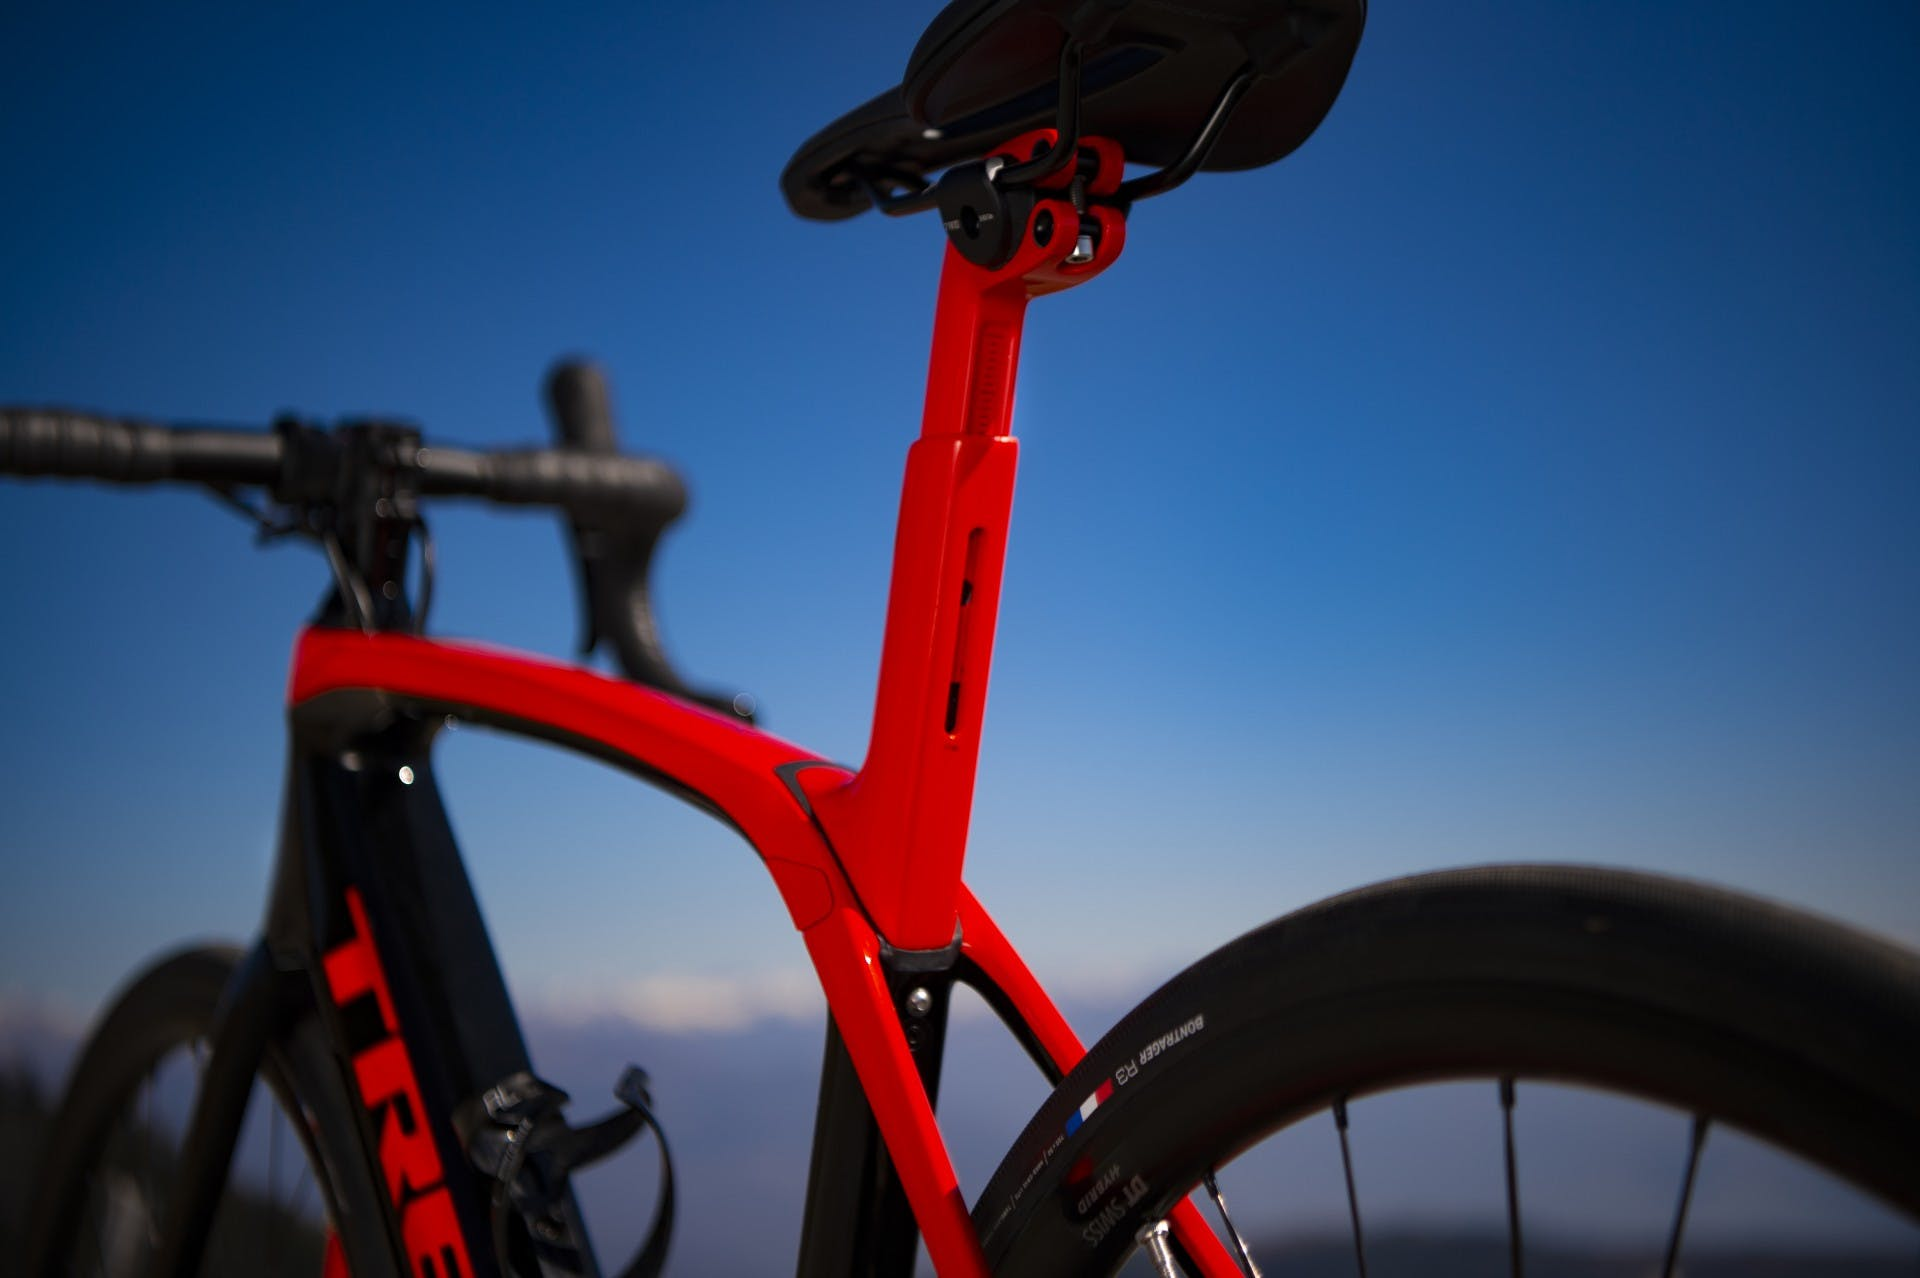 bici elettrica trek Domane+ LT foto statica in esterni particolare sistema isospeed